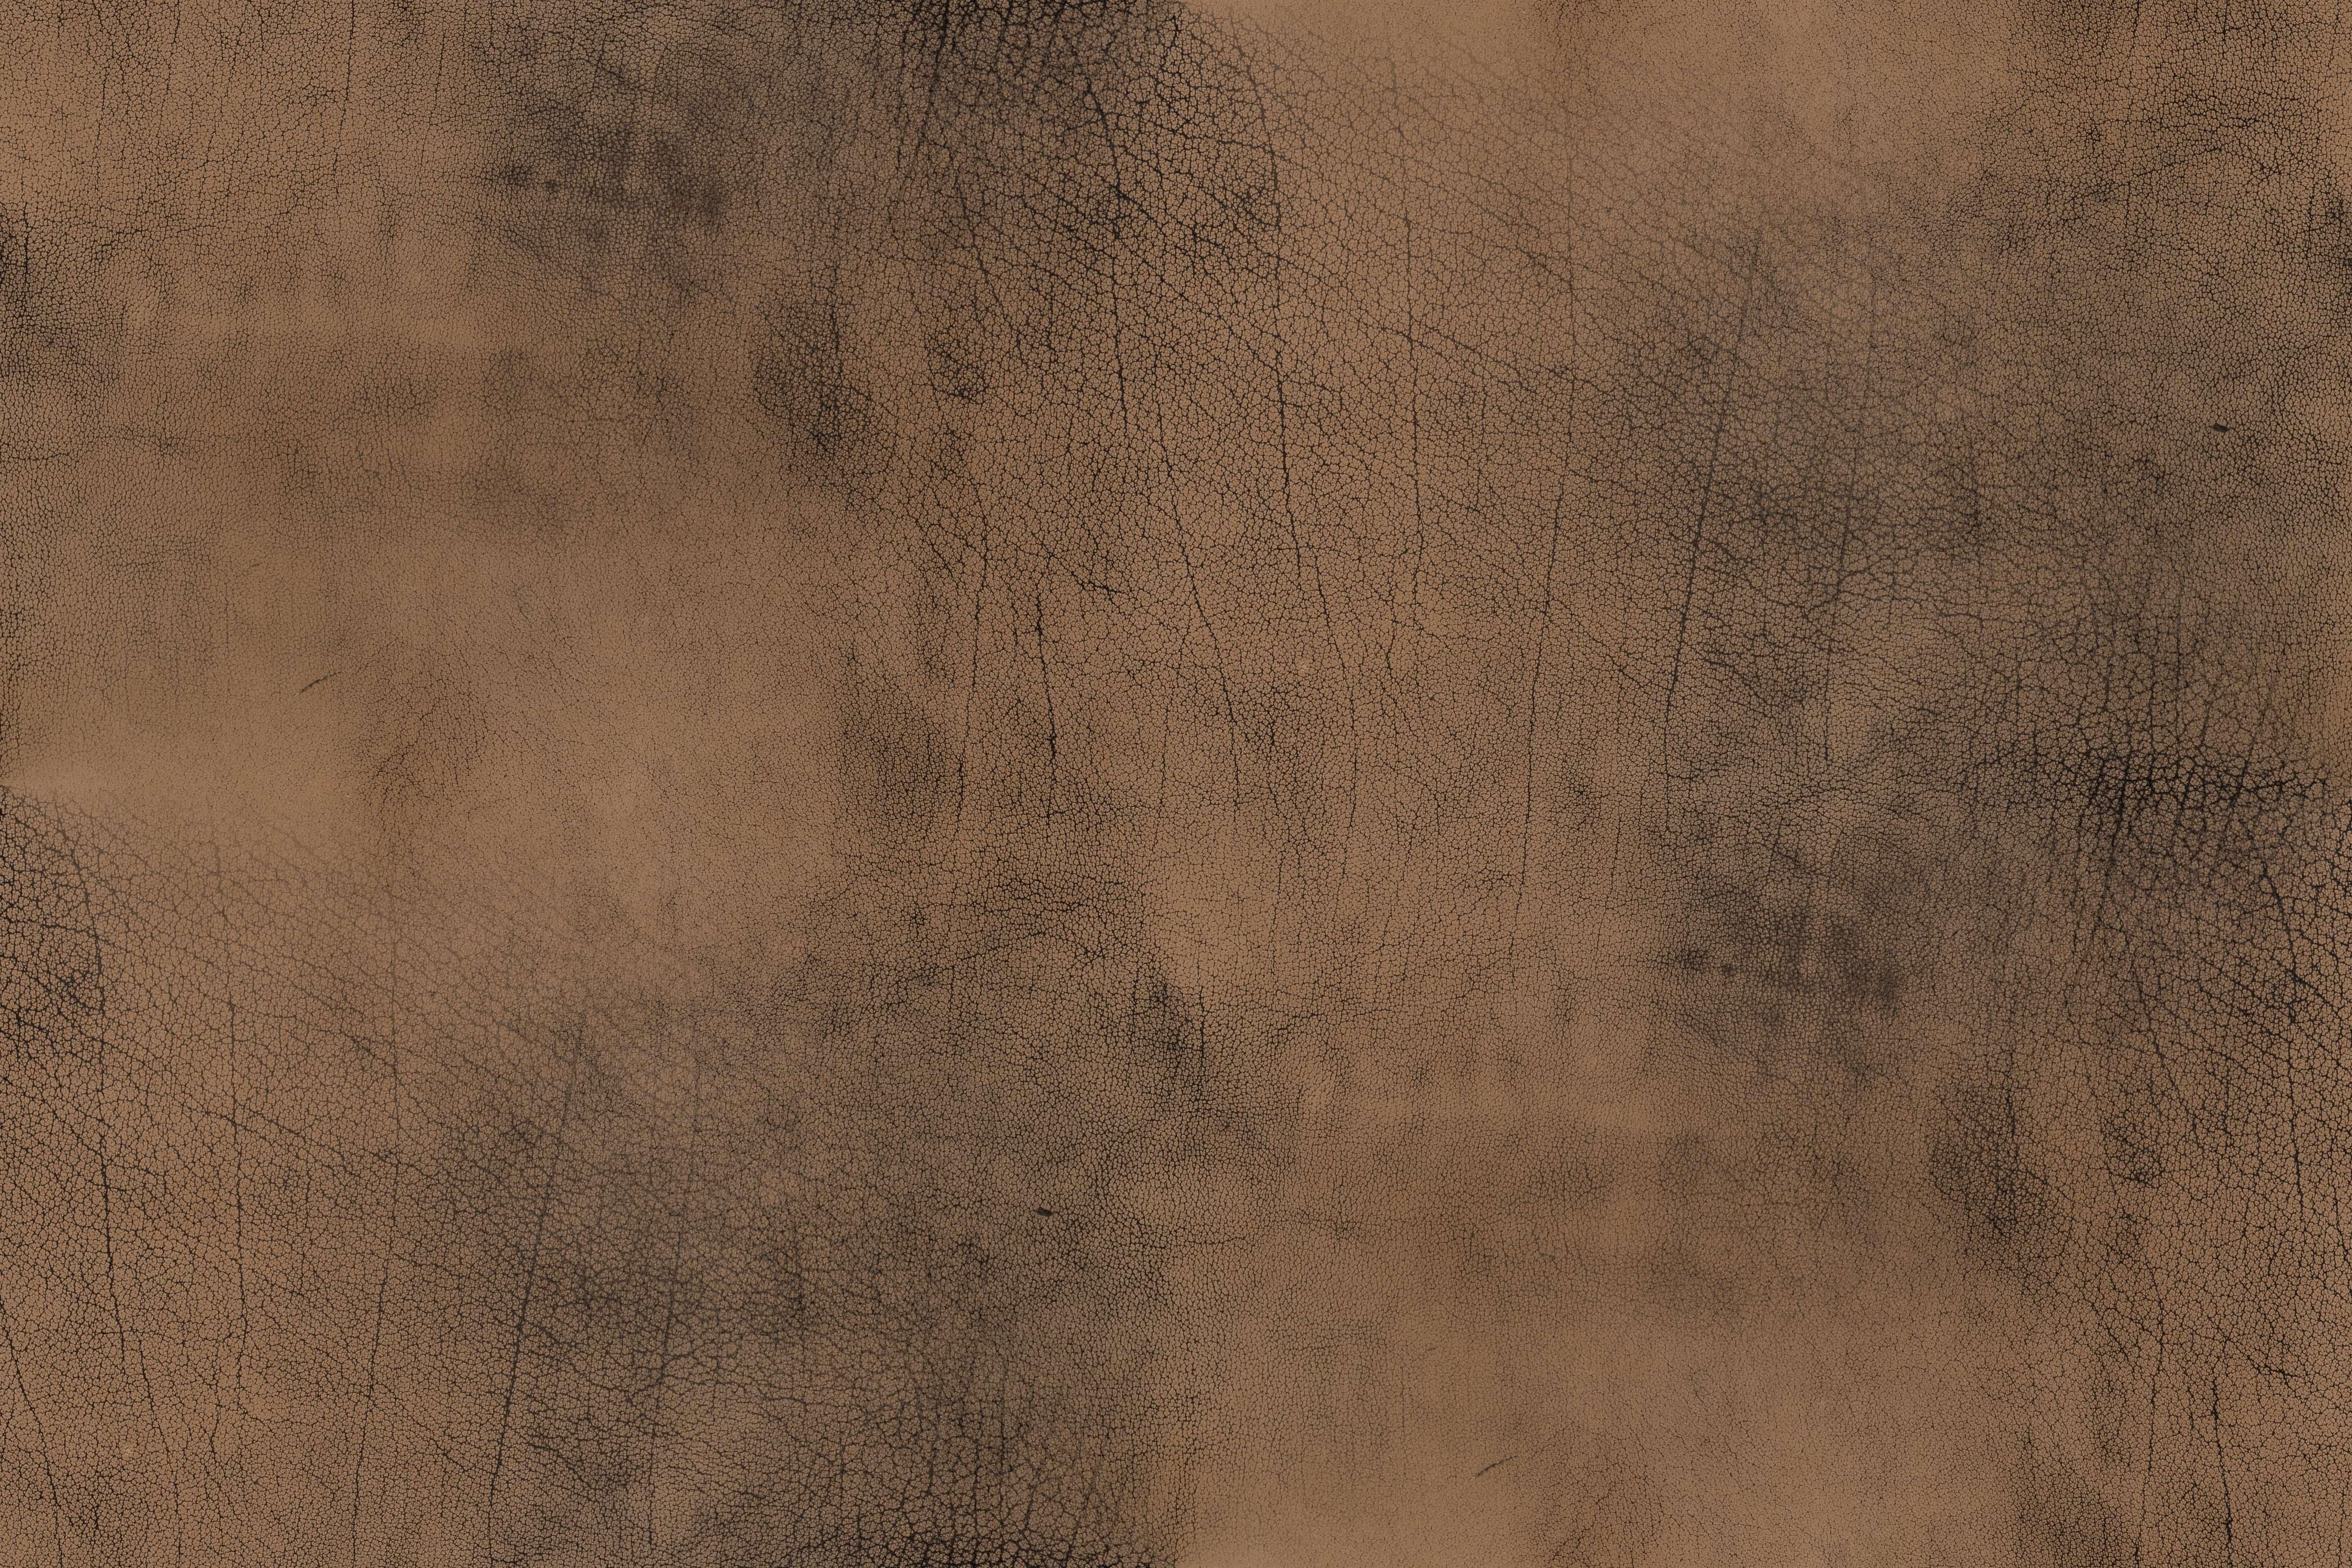 buffalo leather texture